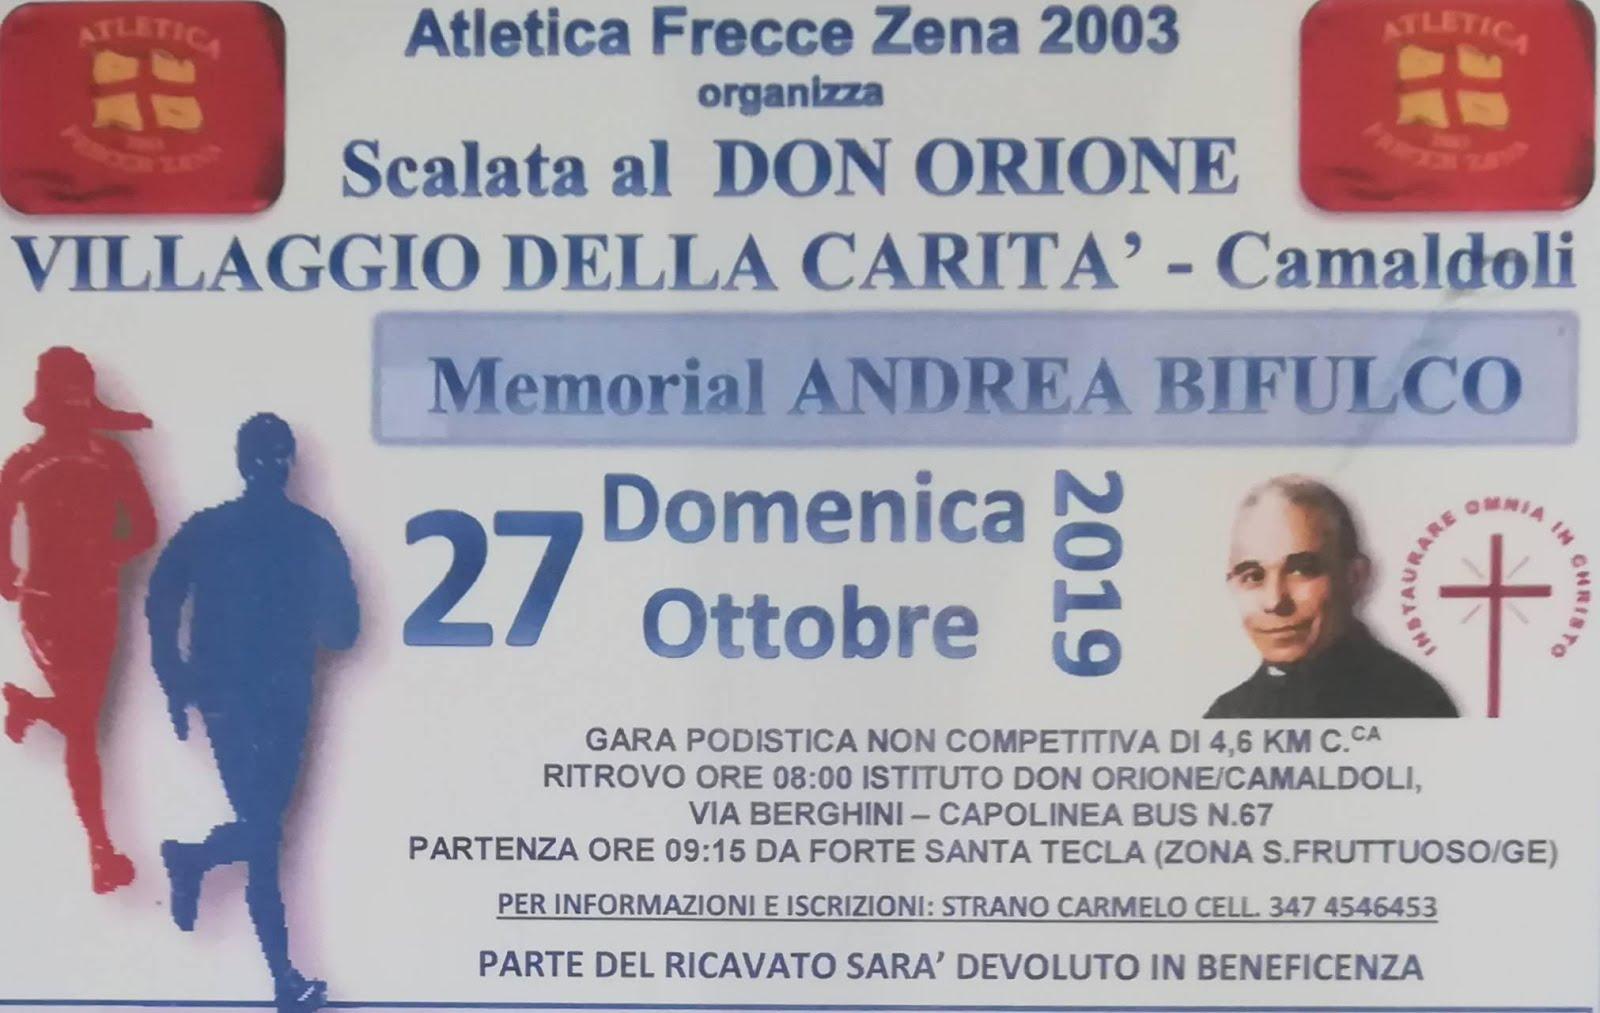 Memorial Andrea Bifulco